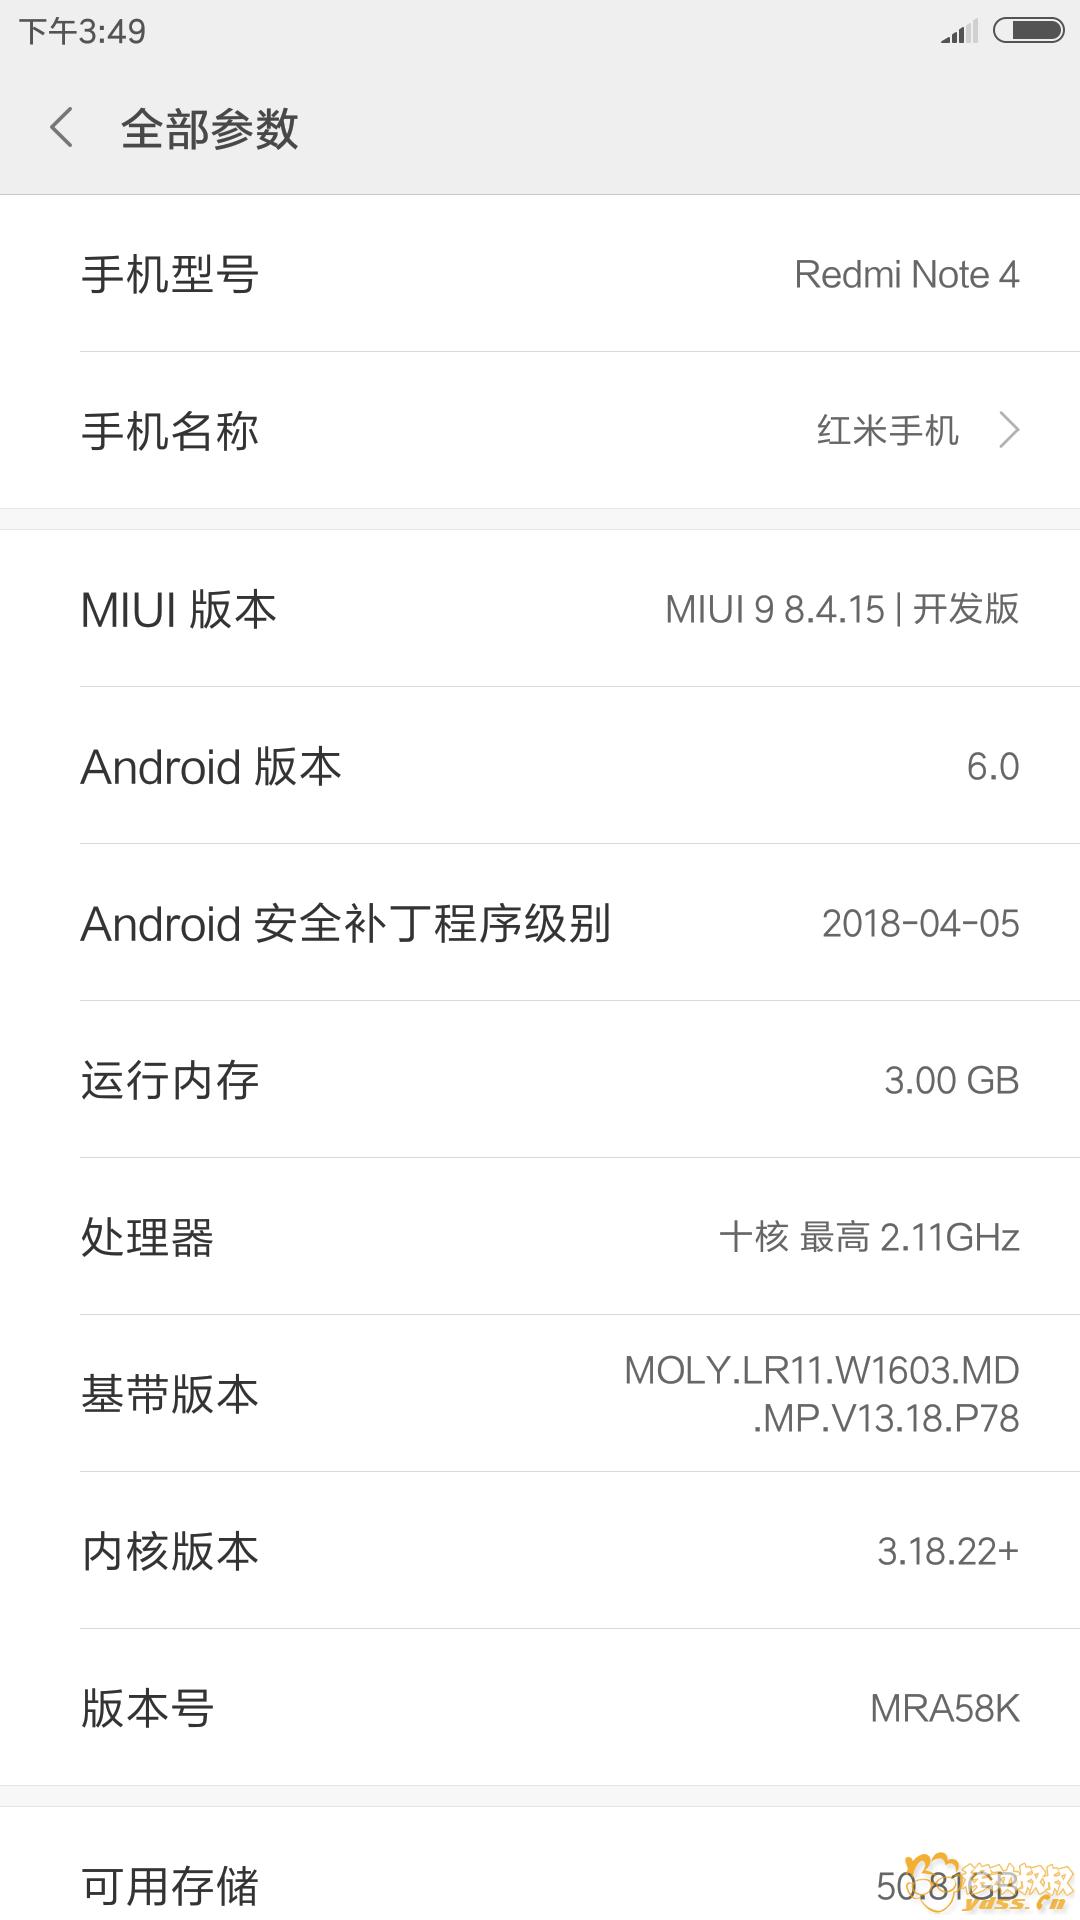 Screenshot_2018-04-15-15-49-15-236_com.android.settings.png